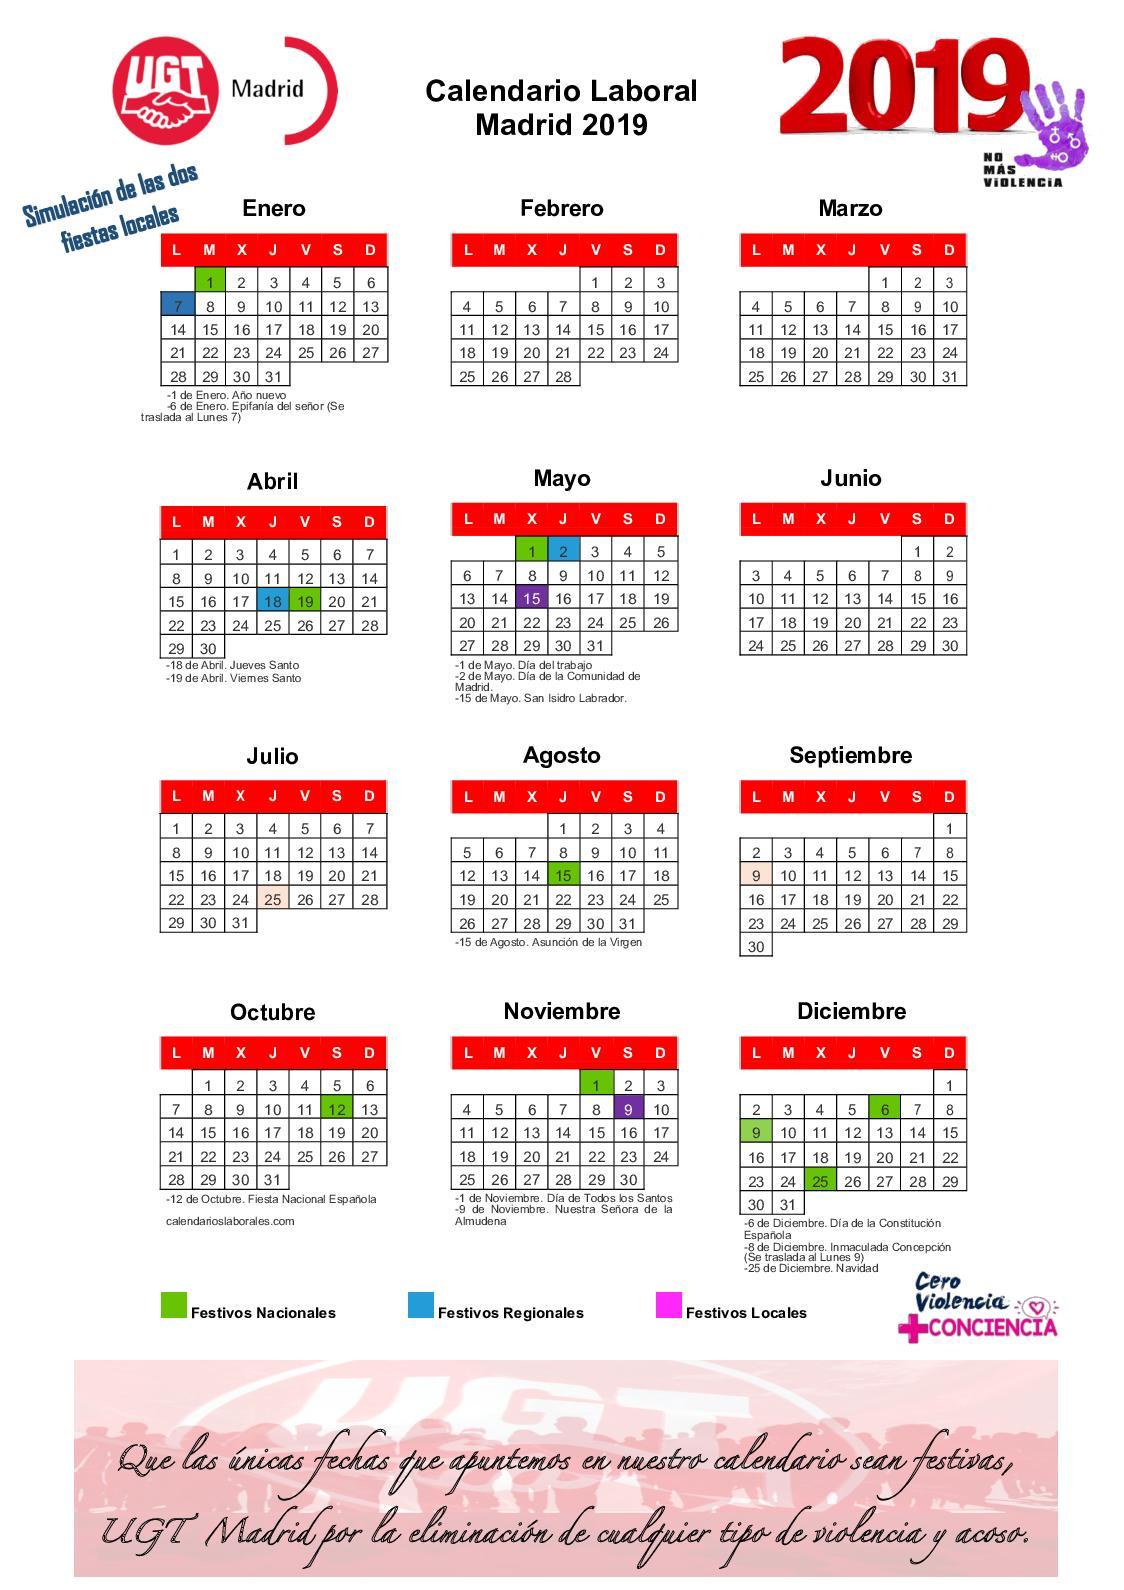 Calendario Laboral Espana 2019.Calameo Calendario Laboral 2019 Municipio De Madrid